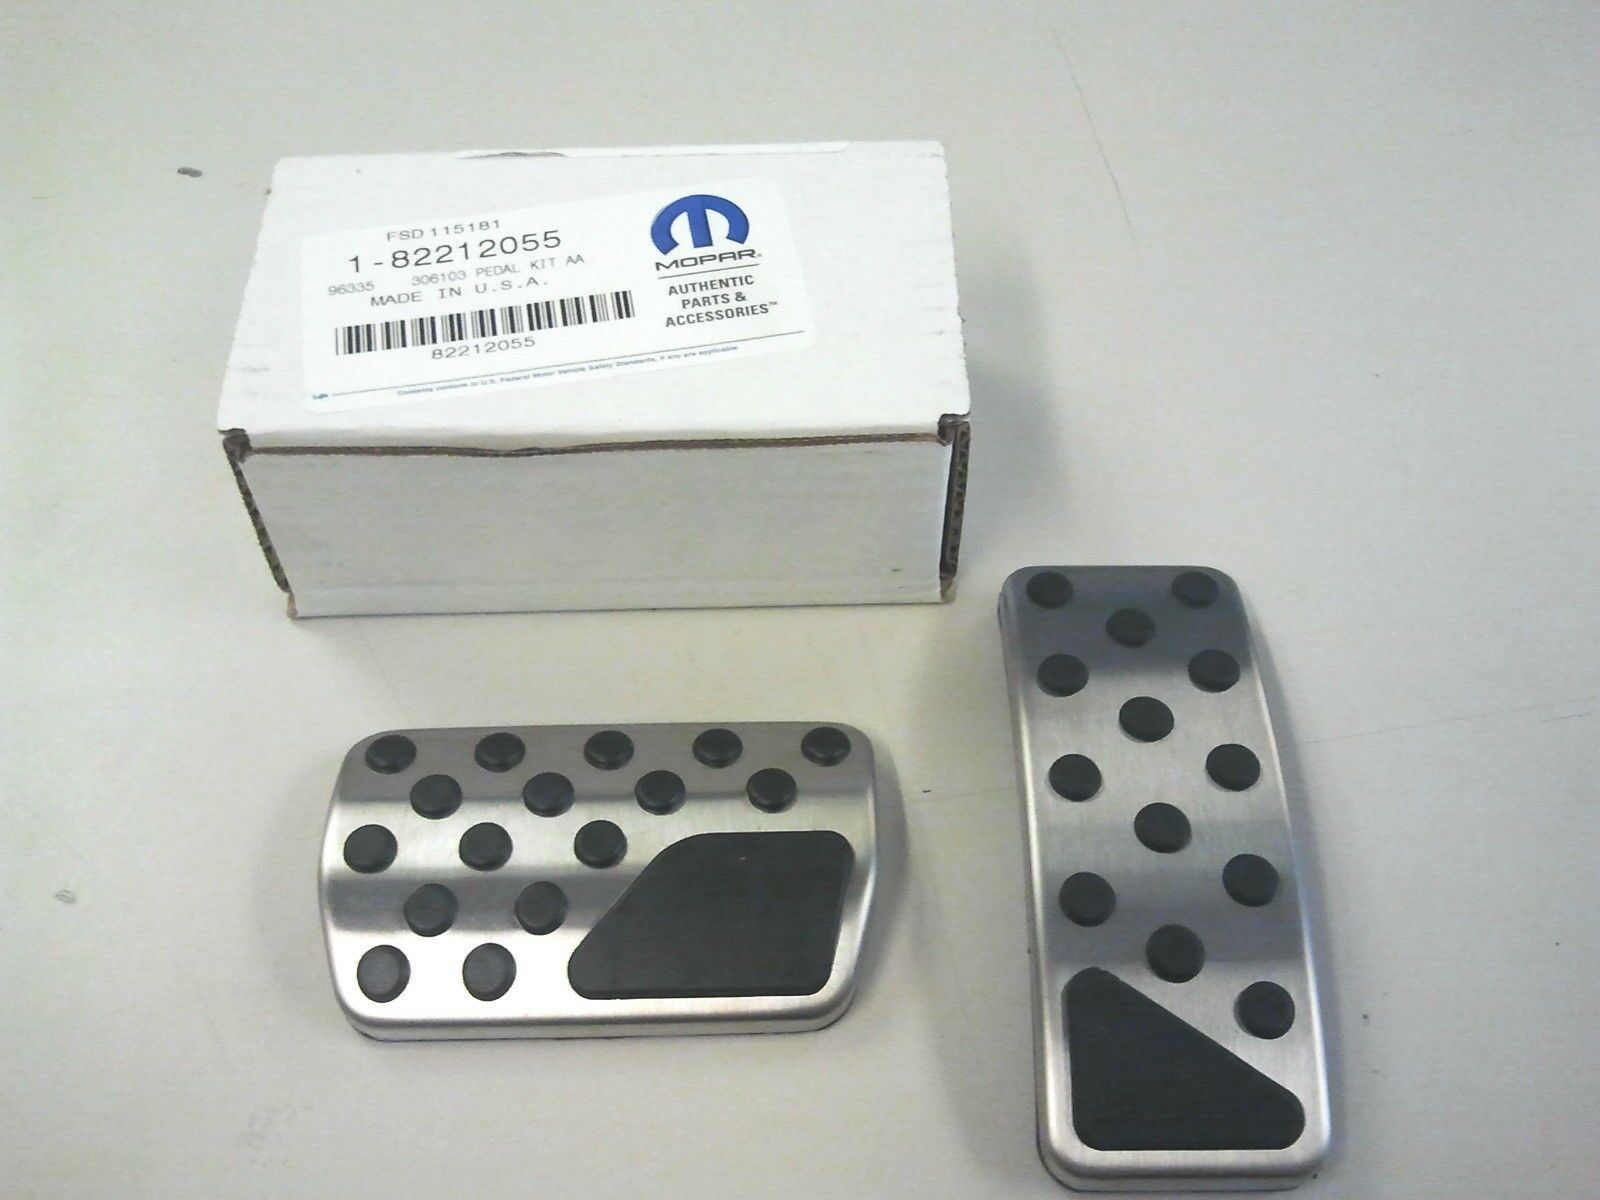 Genuine Jeep Accessories 82212055 Pedal Kit